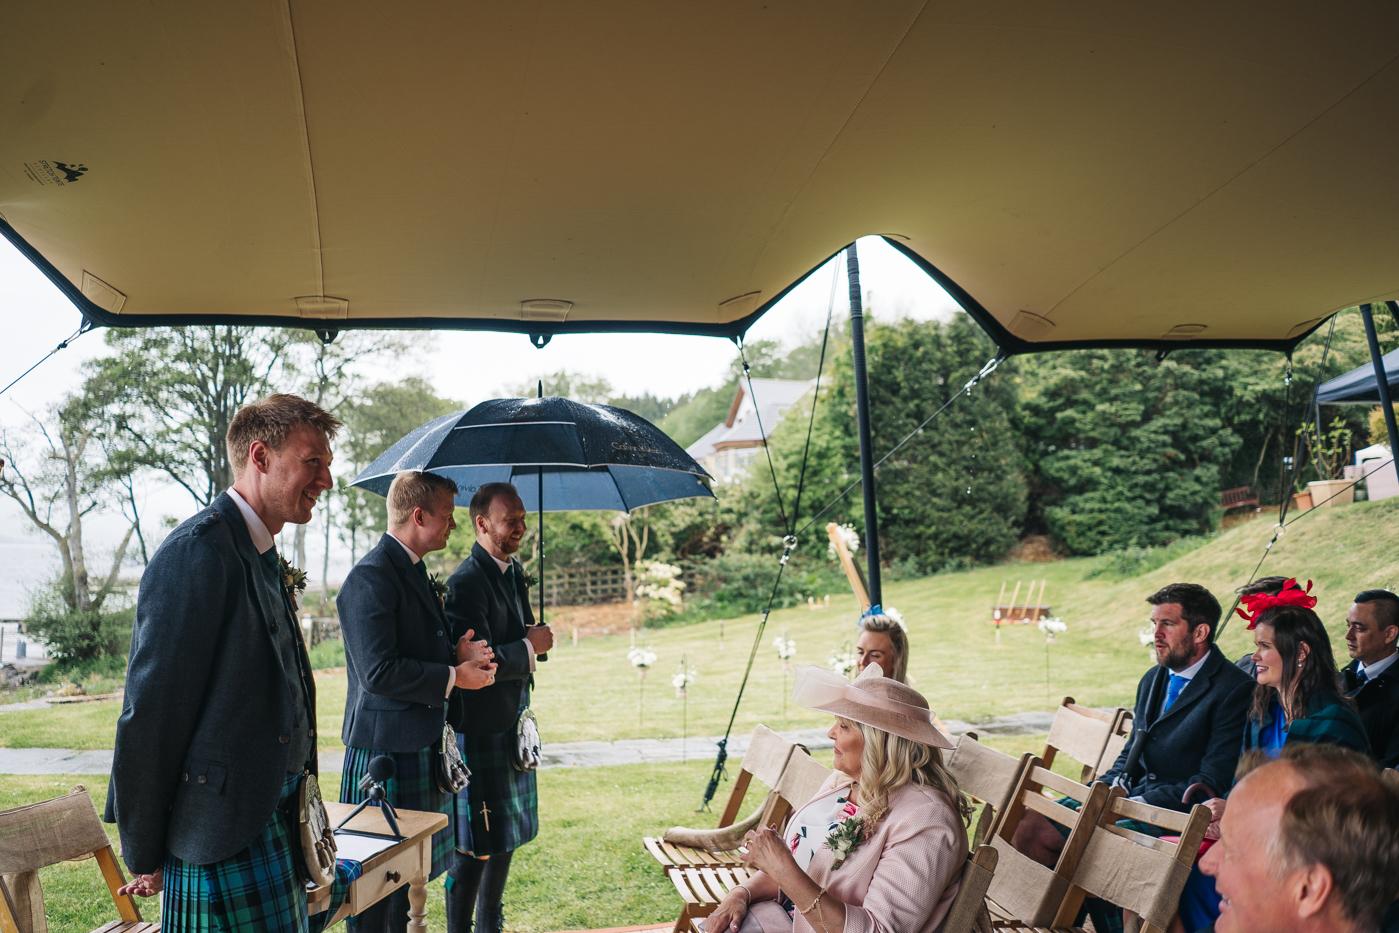 scottish-wedding-trossachs-loch-tay-highlannds-relaxed-photography-photographer-0014.jpg